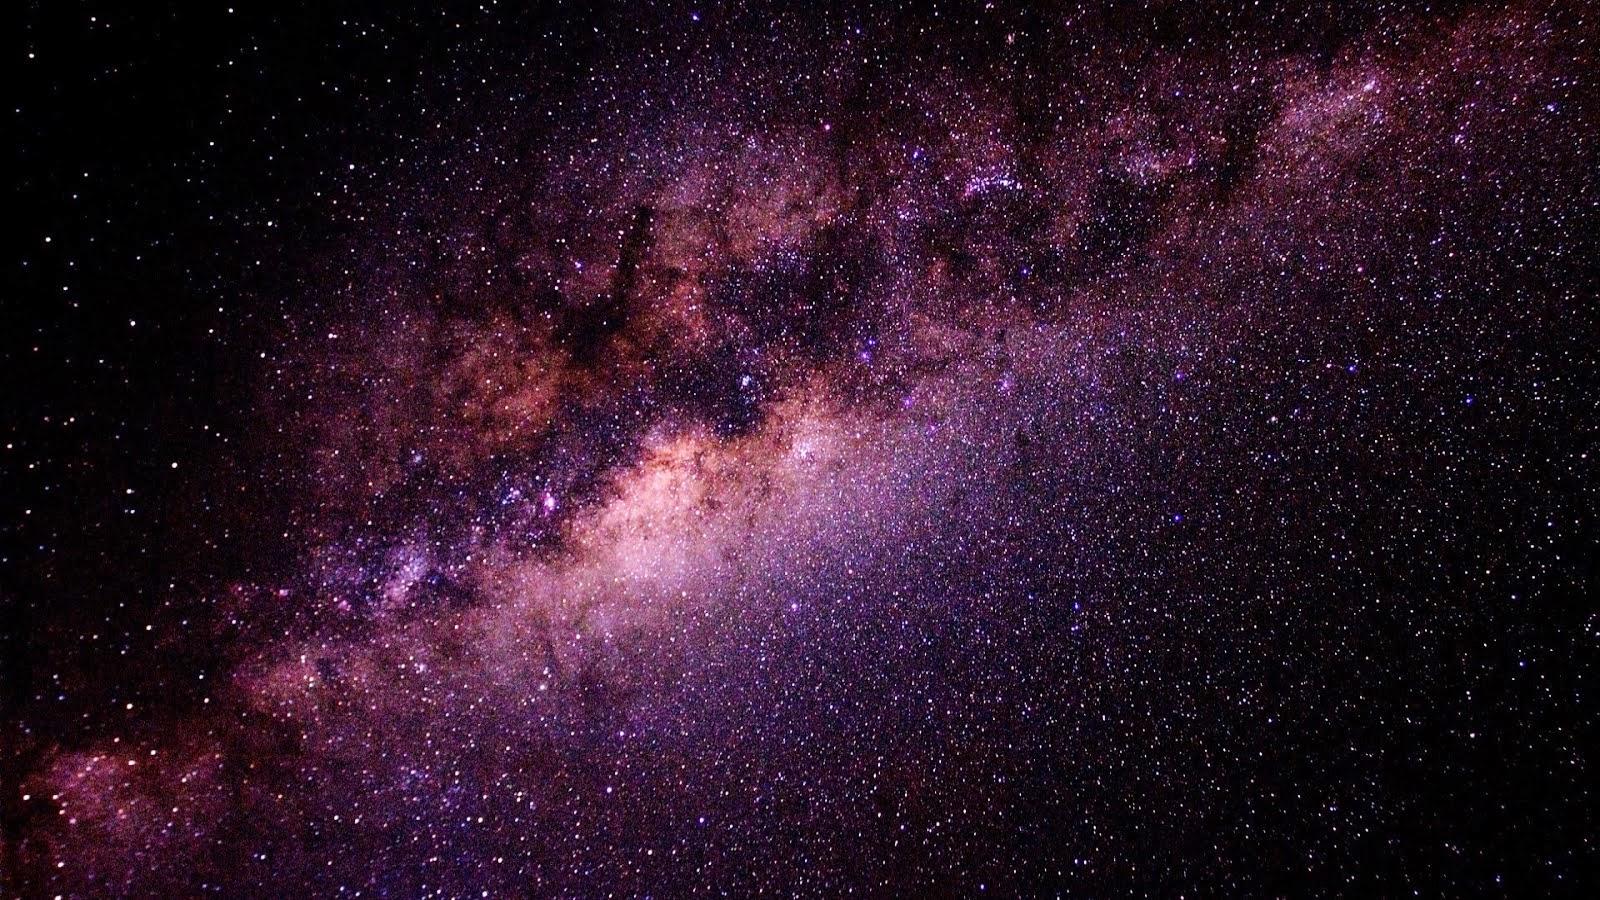 40 Hd Milky Way Galaxy Wallpaper On Wallpapersafari